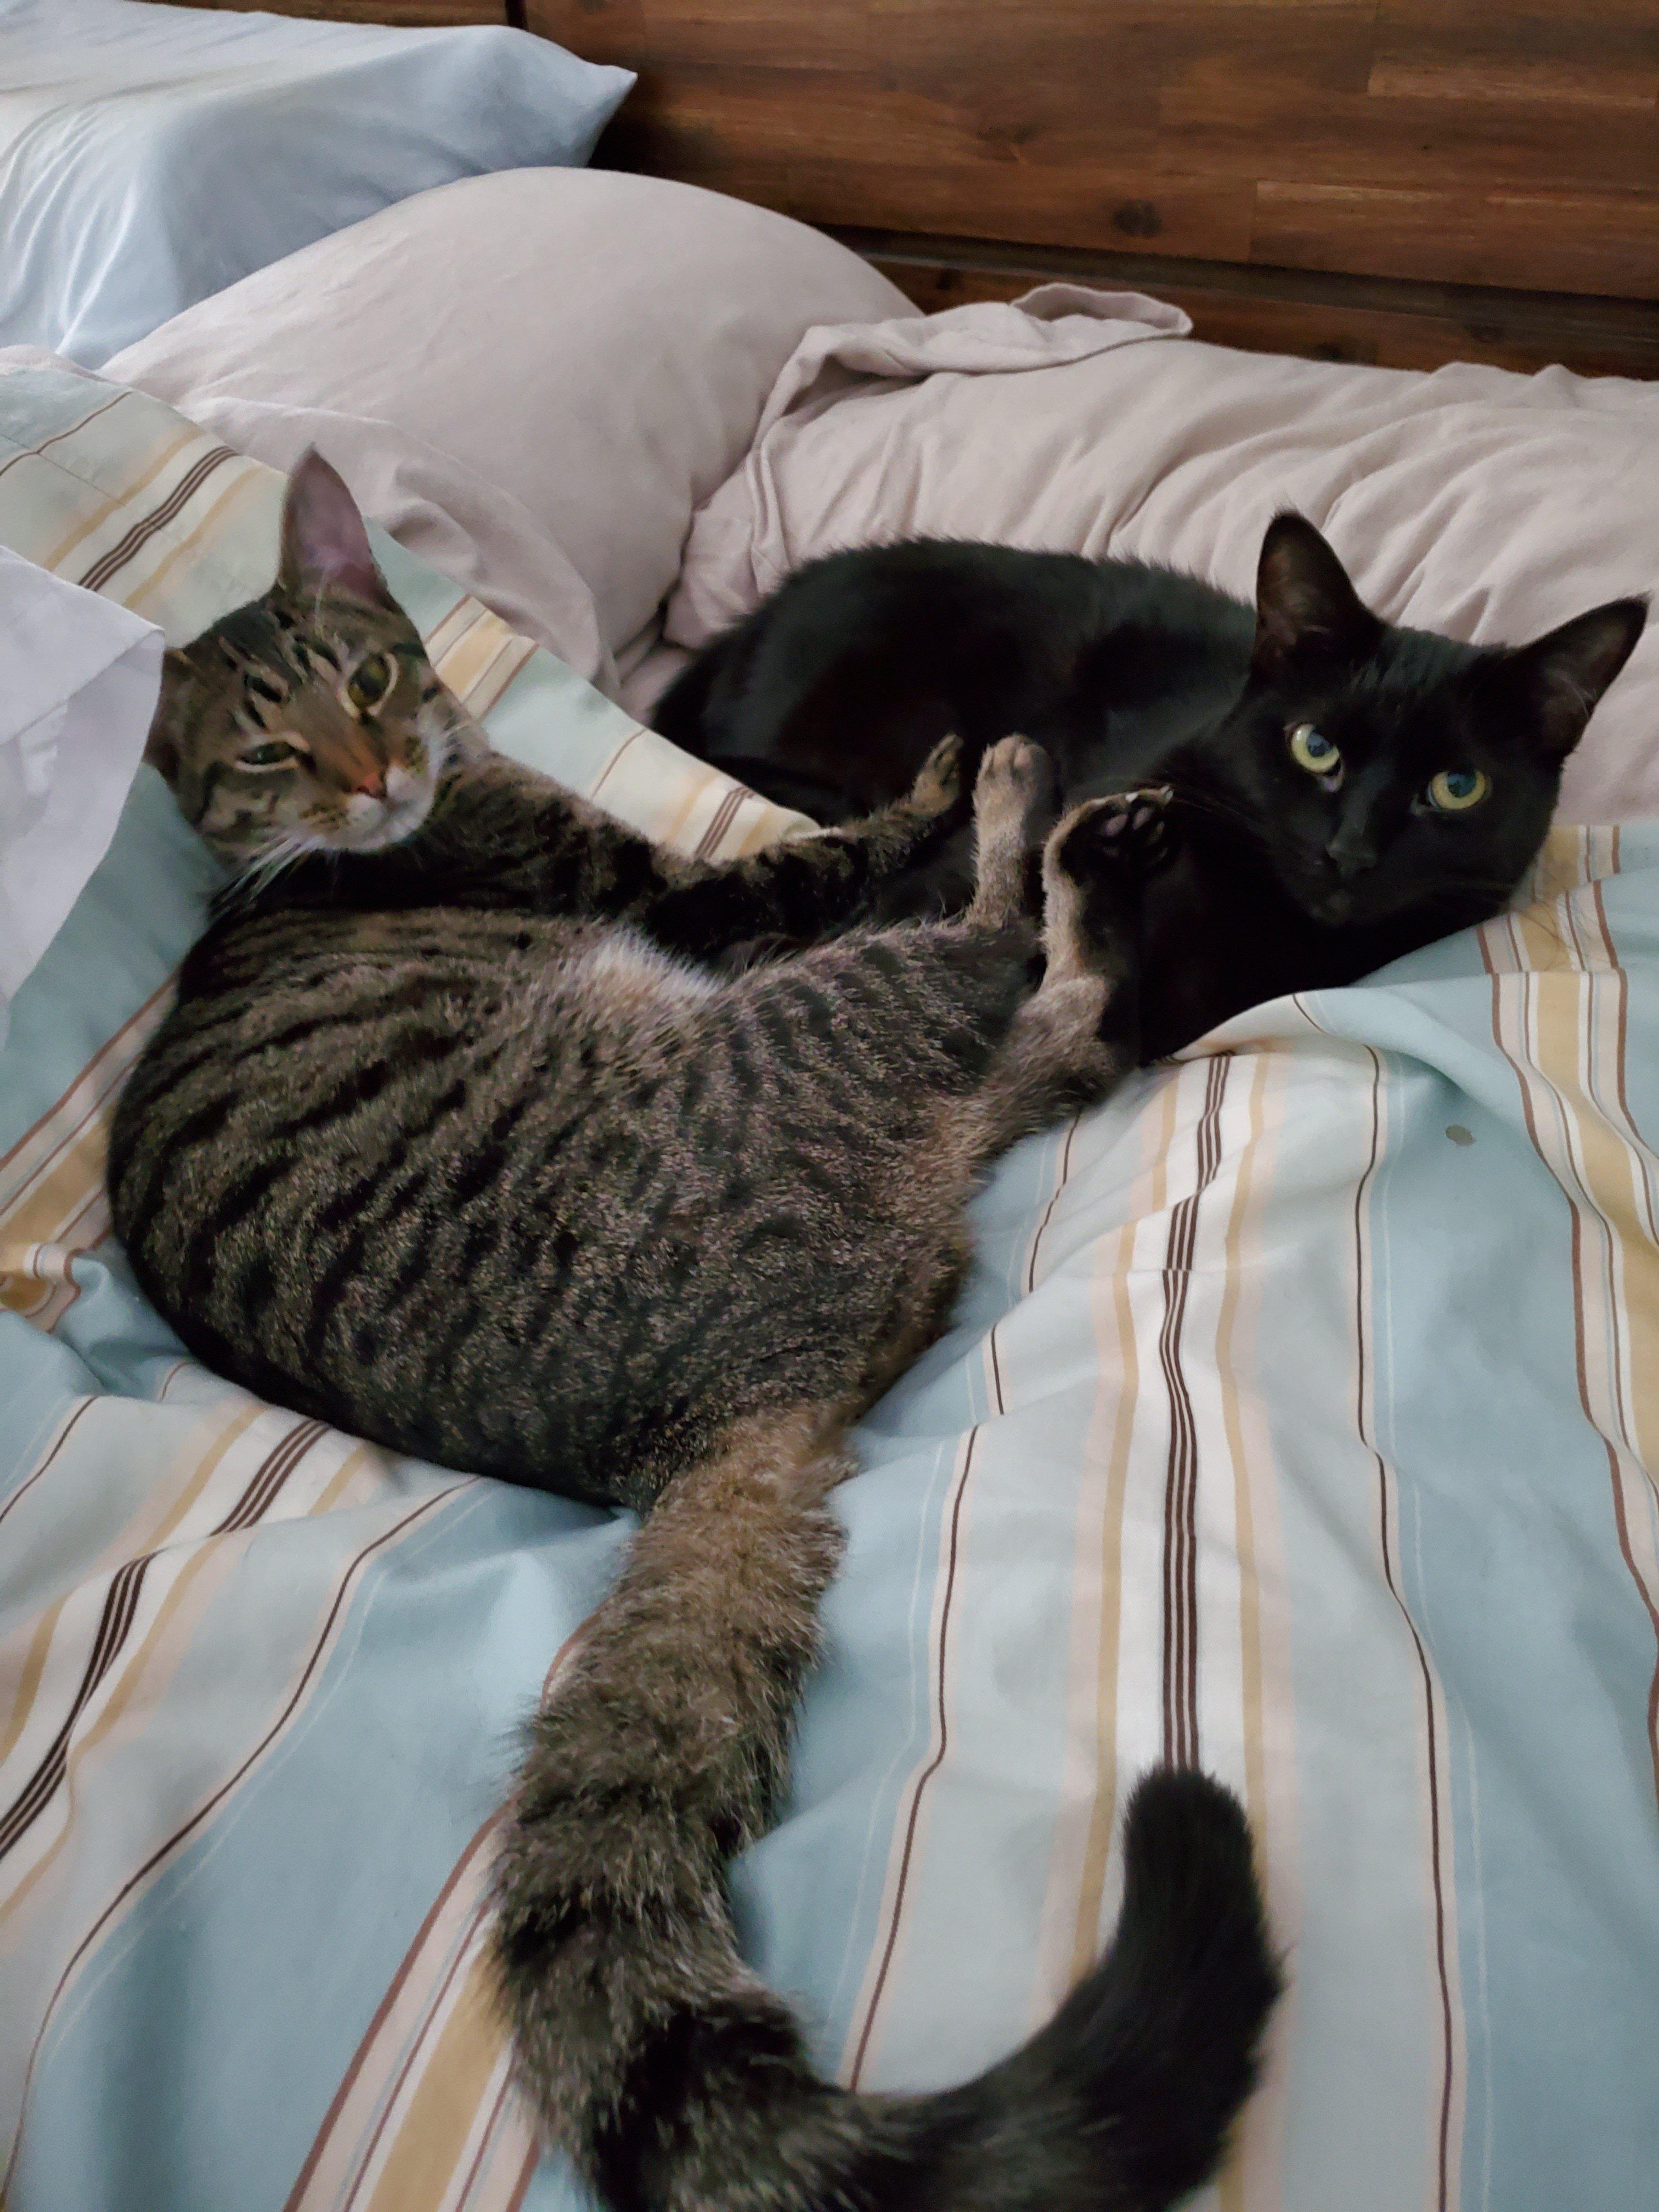 Kitty nap.jpg